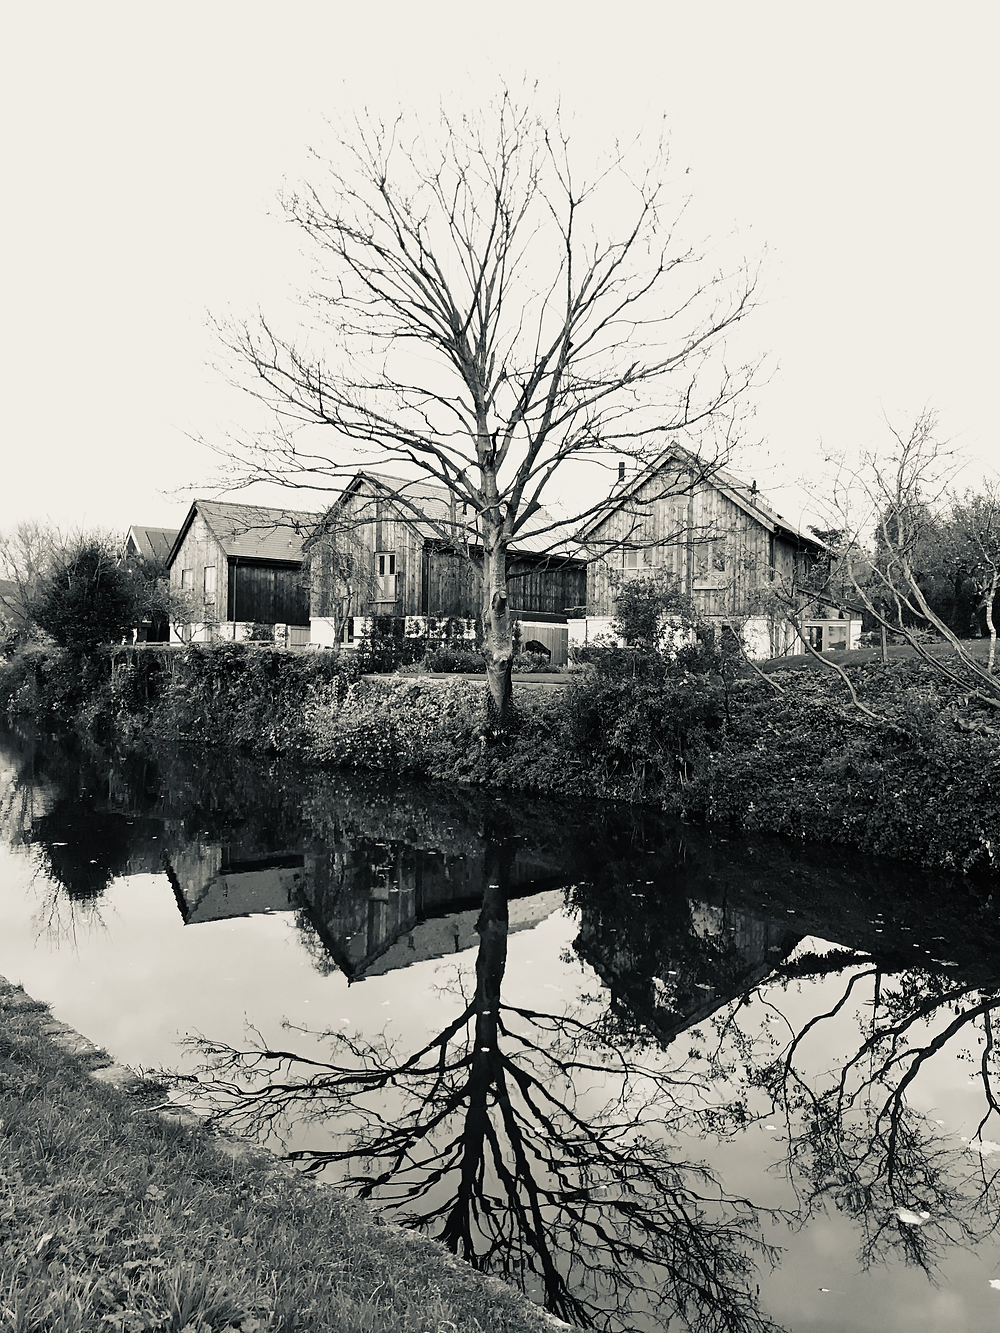 Black & white photography by Mark Blezard